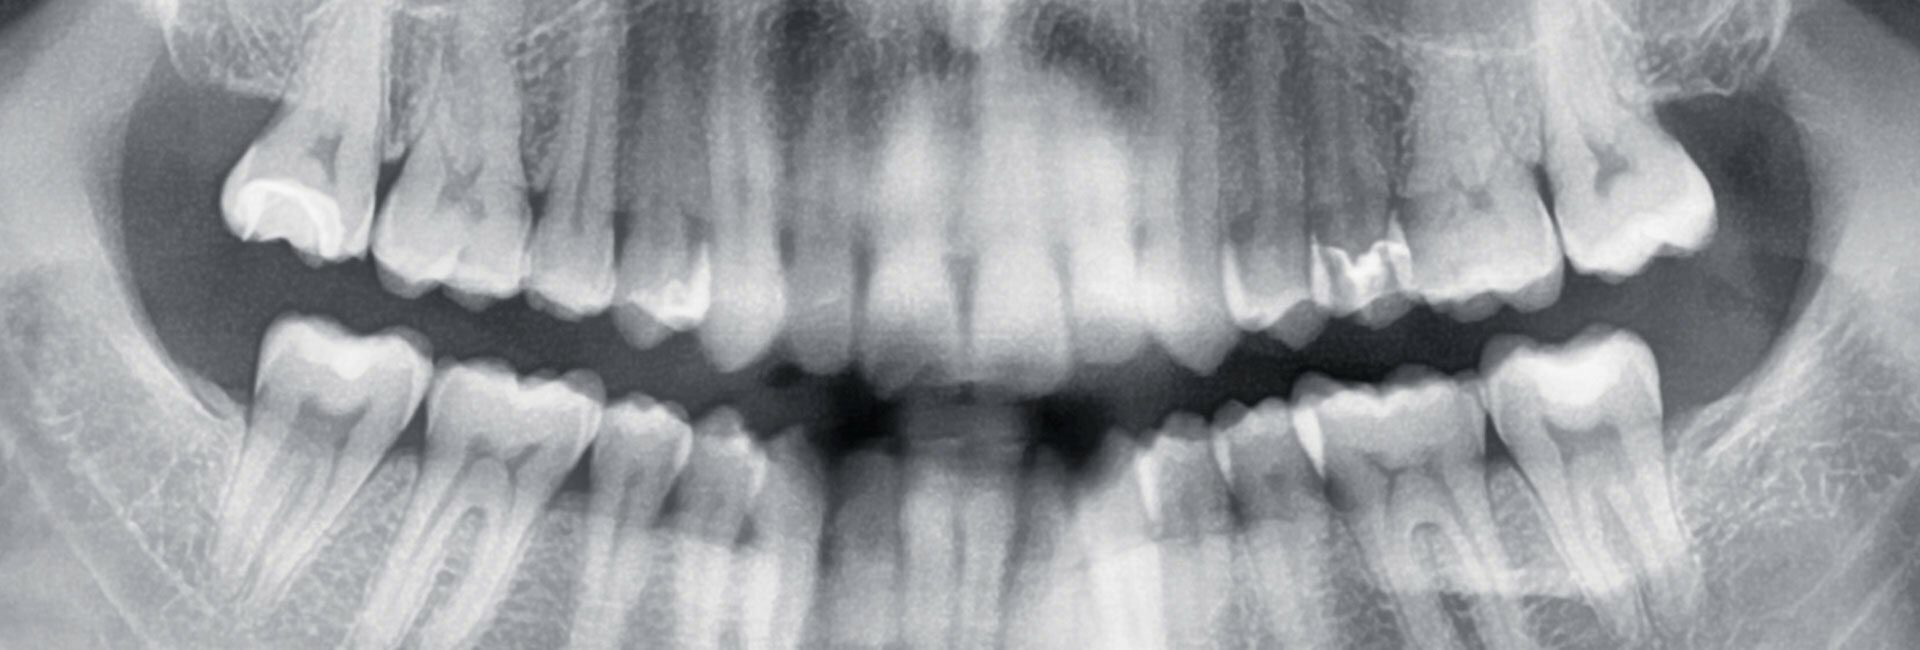 Röntgenbild mit dem Befund Karies